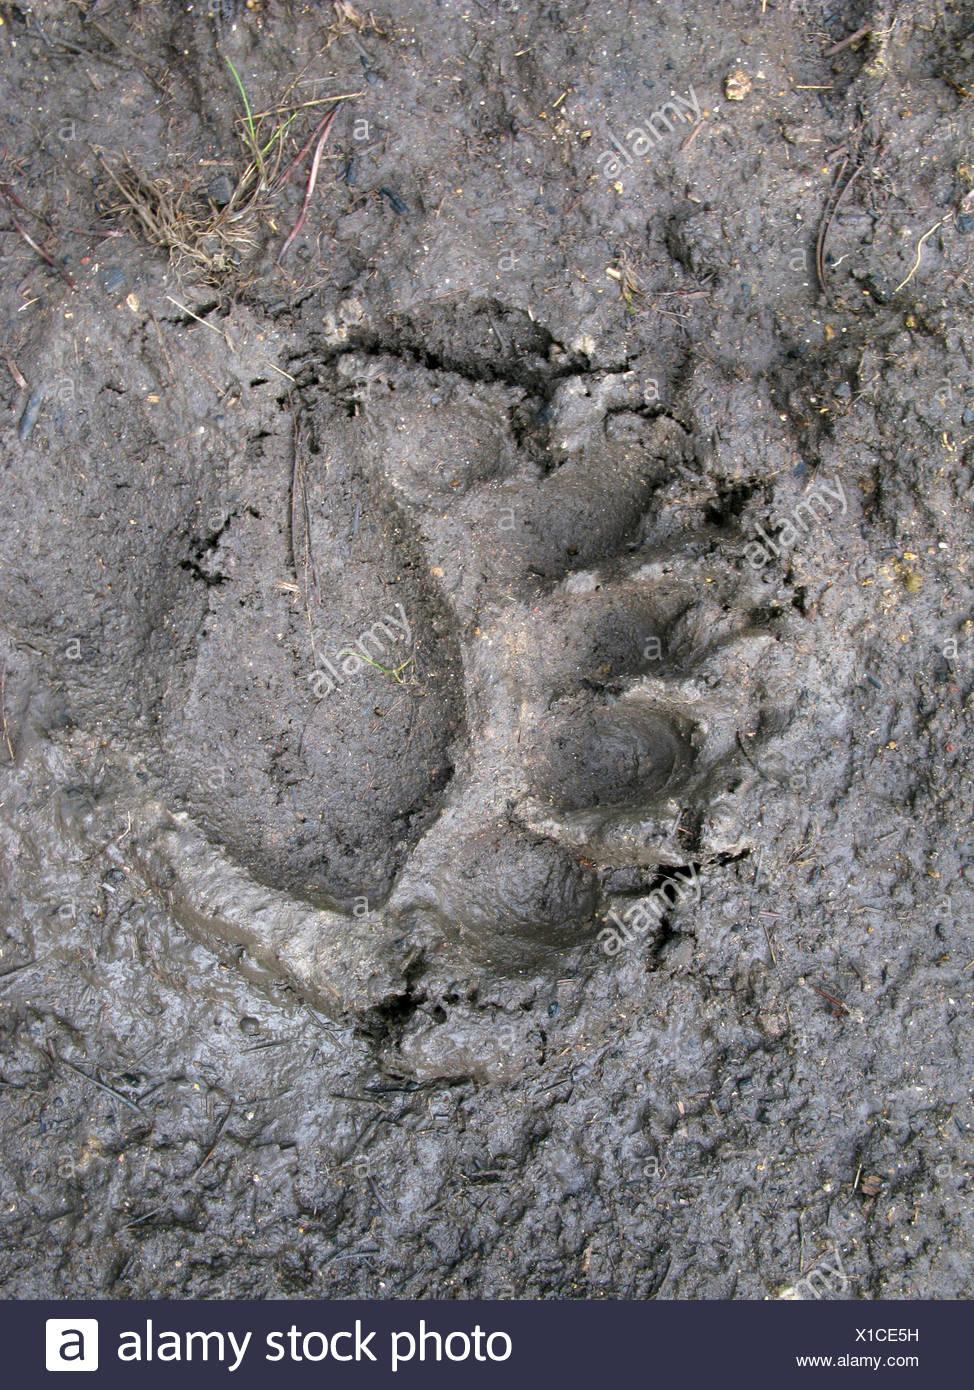 Footprint, American black bear (Ursus americanus), Yellowstone National Park, Wyoming, USA, North America - Stock Image